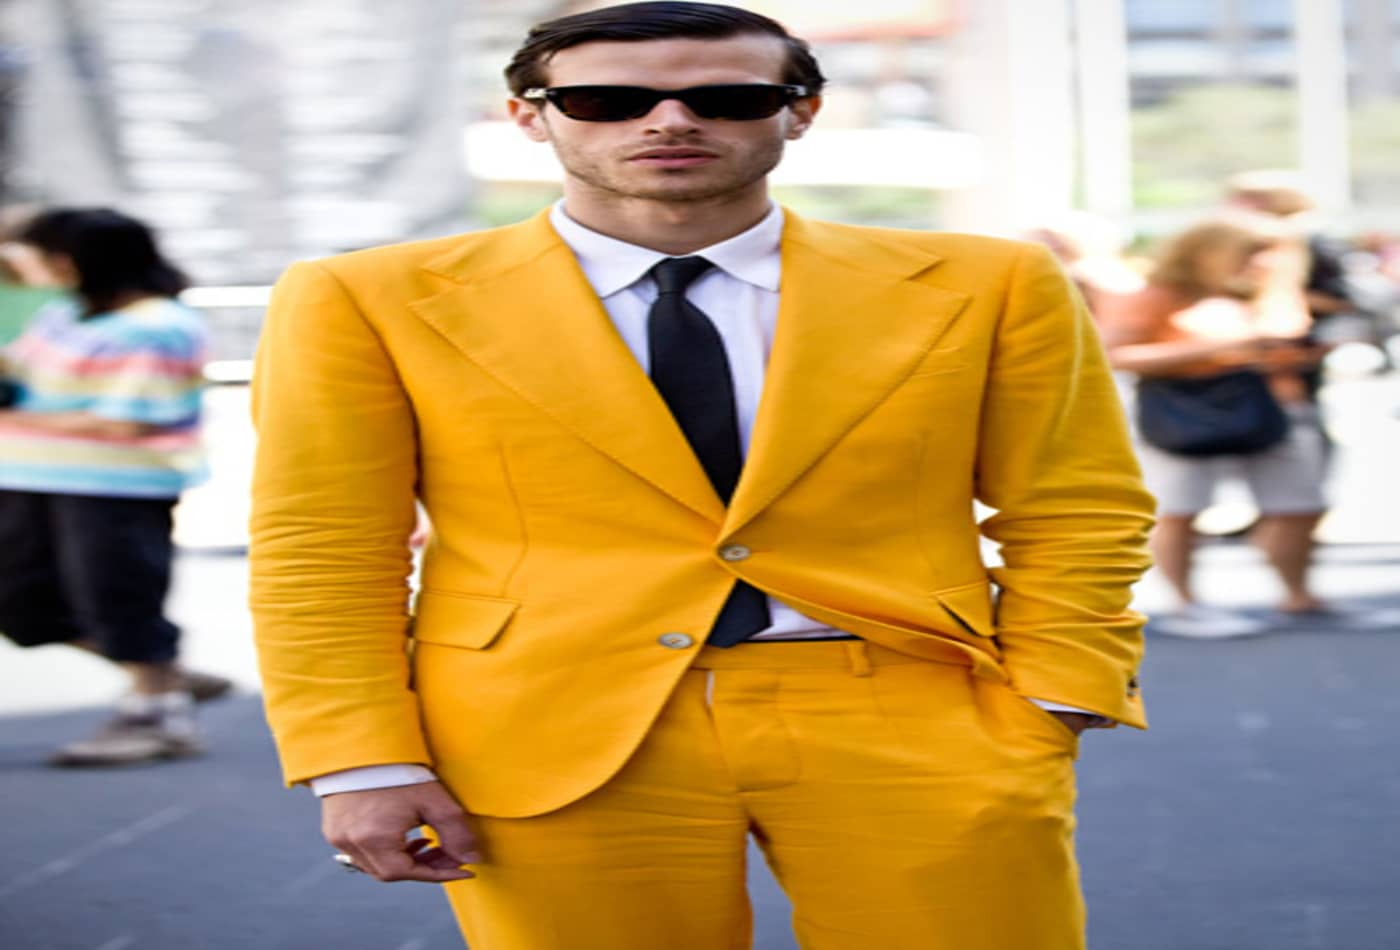 Mercedes-Benz-Fashion-week-2012-man-yellow-suit.jpg